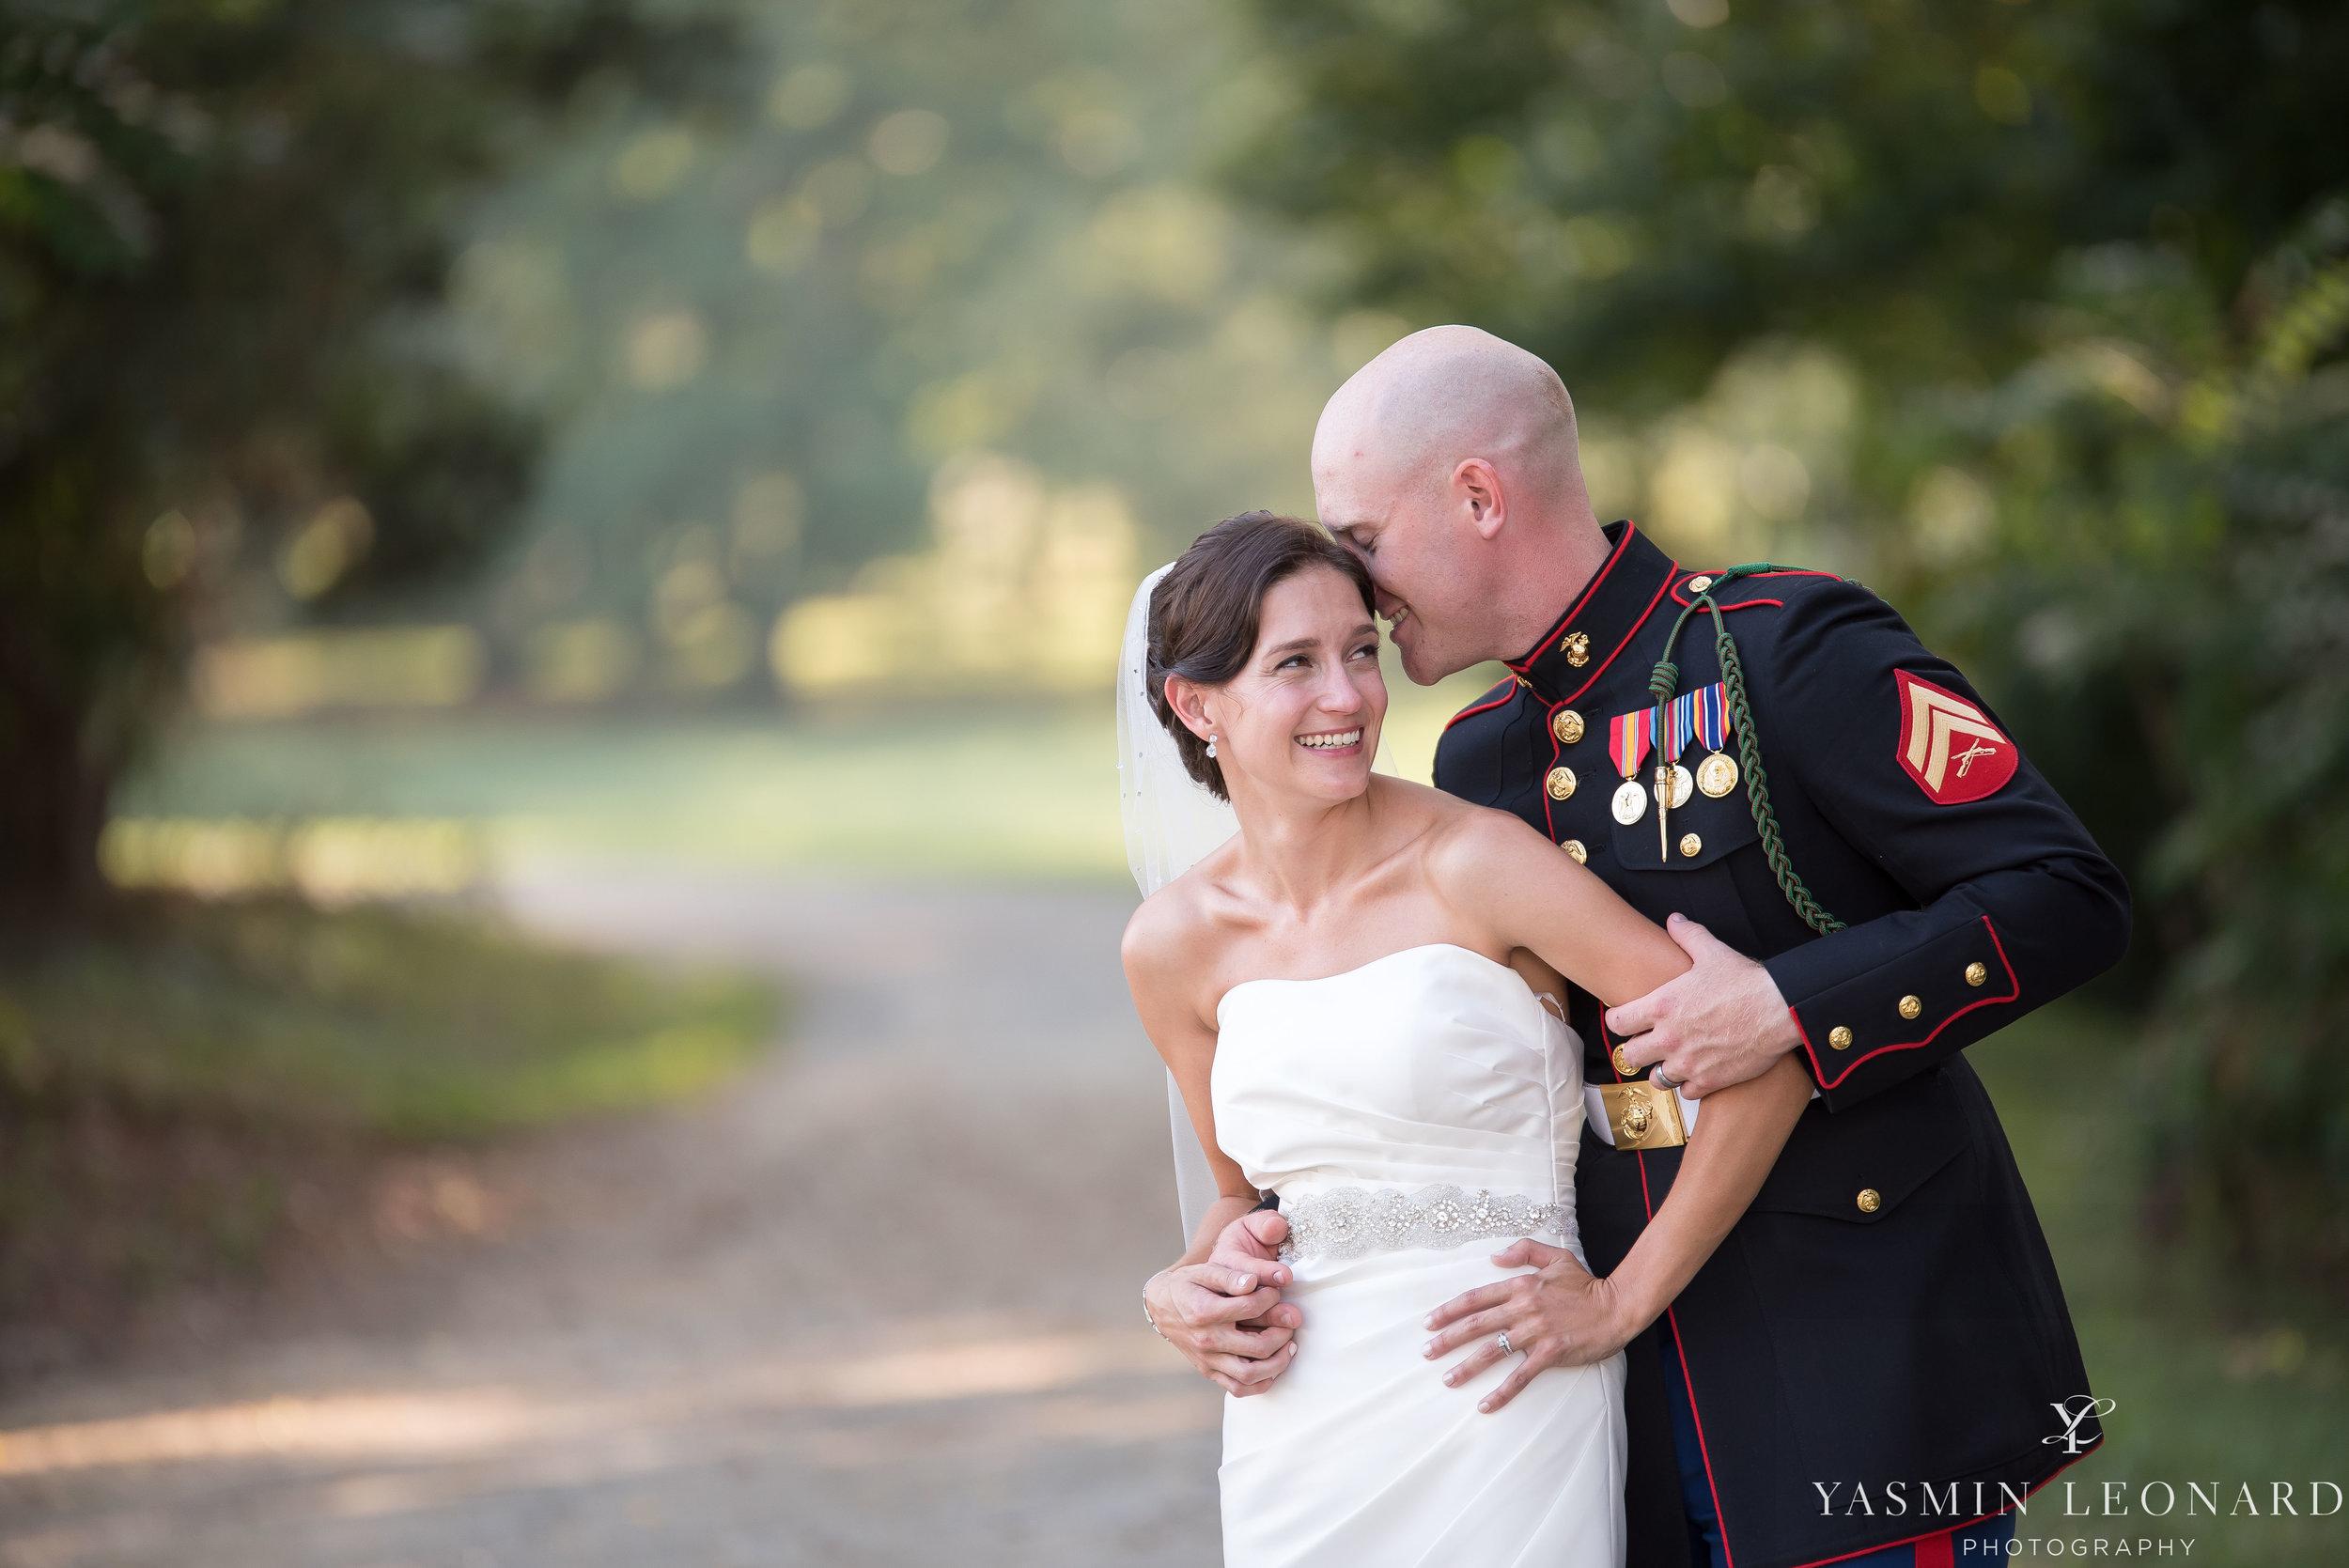 Sara and Nathan | Summerfield Farms | Yasmin Leonard Photography-49.jpg